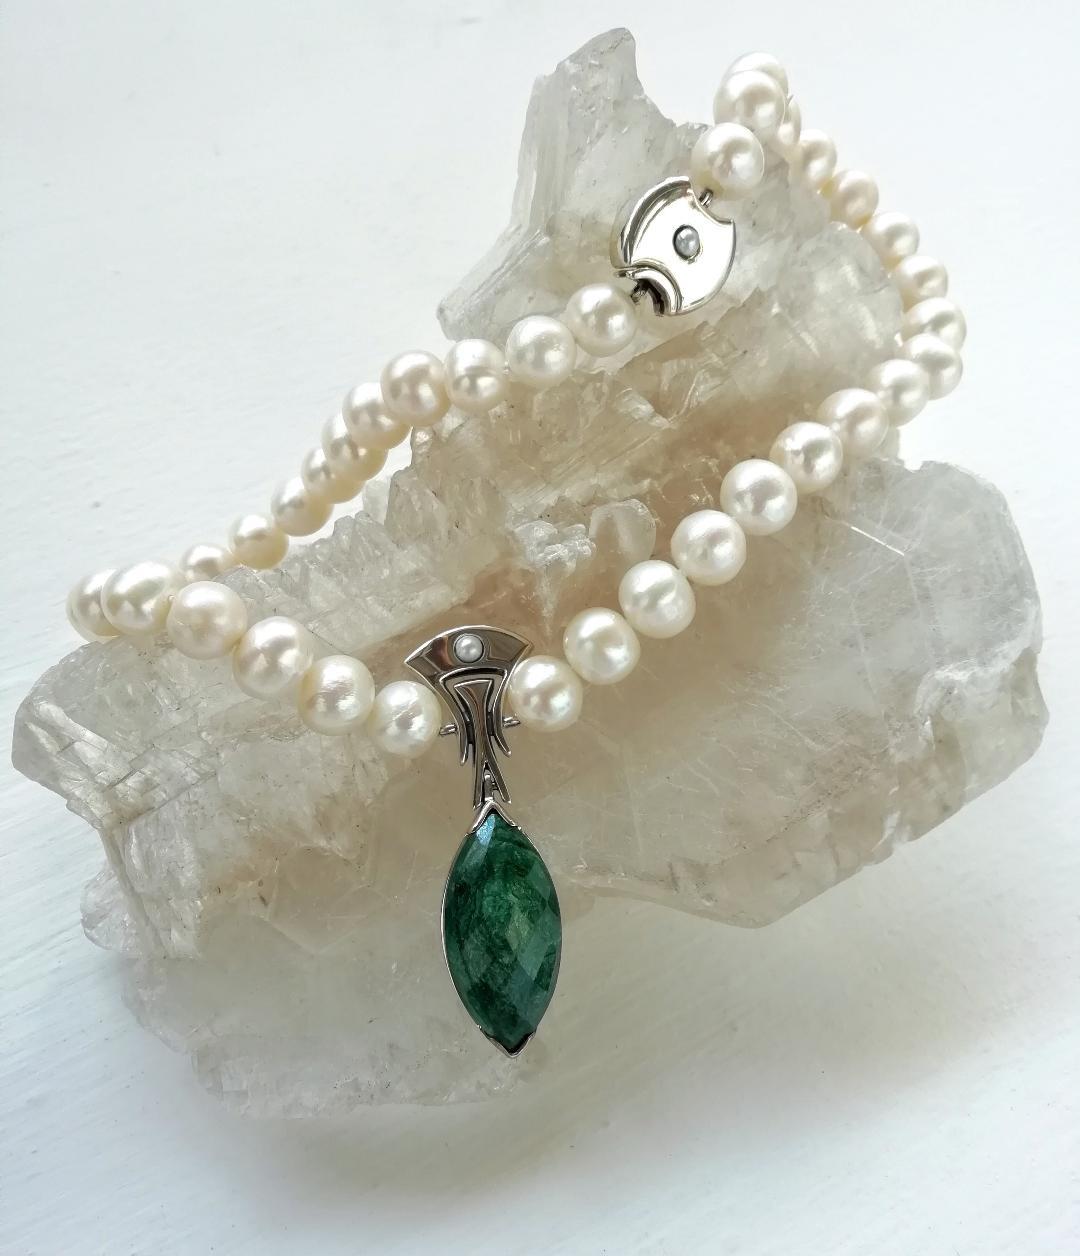 Gota Esmeralda Plata, esmeralda y perla